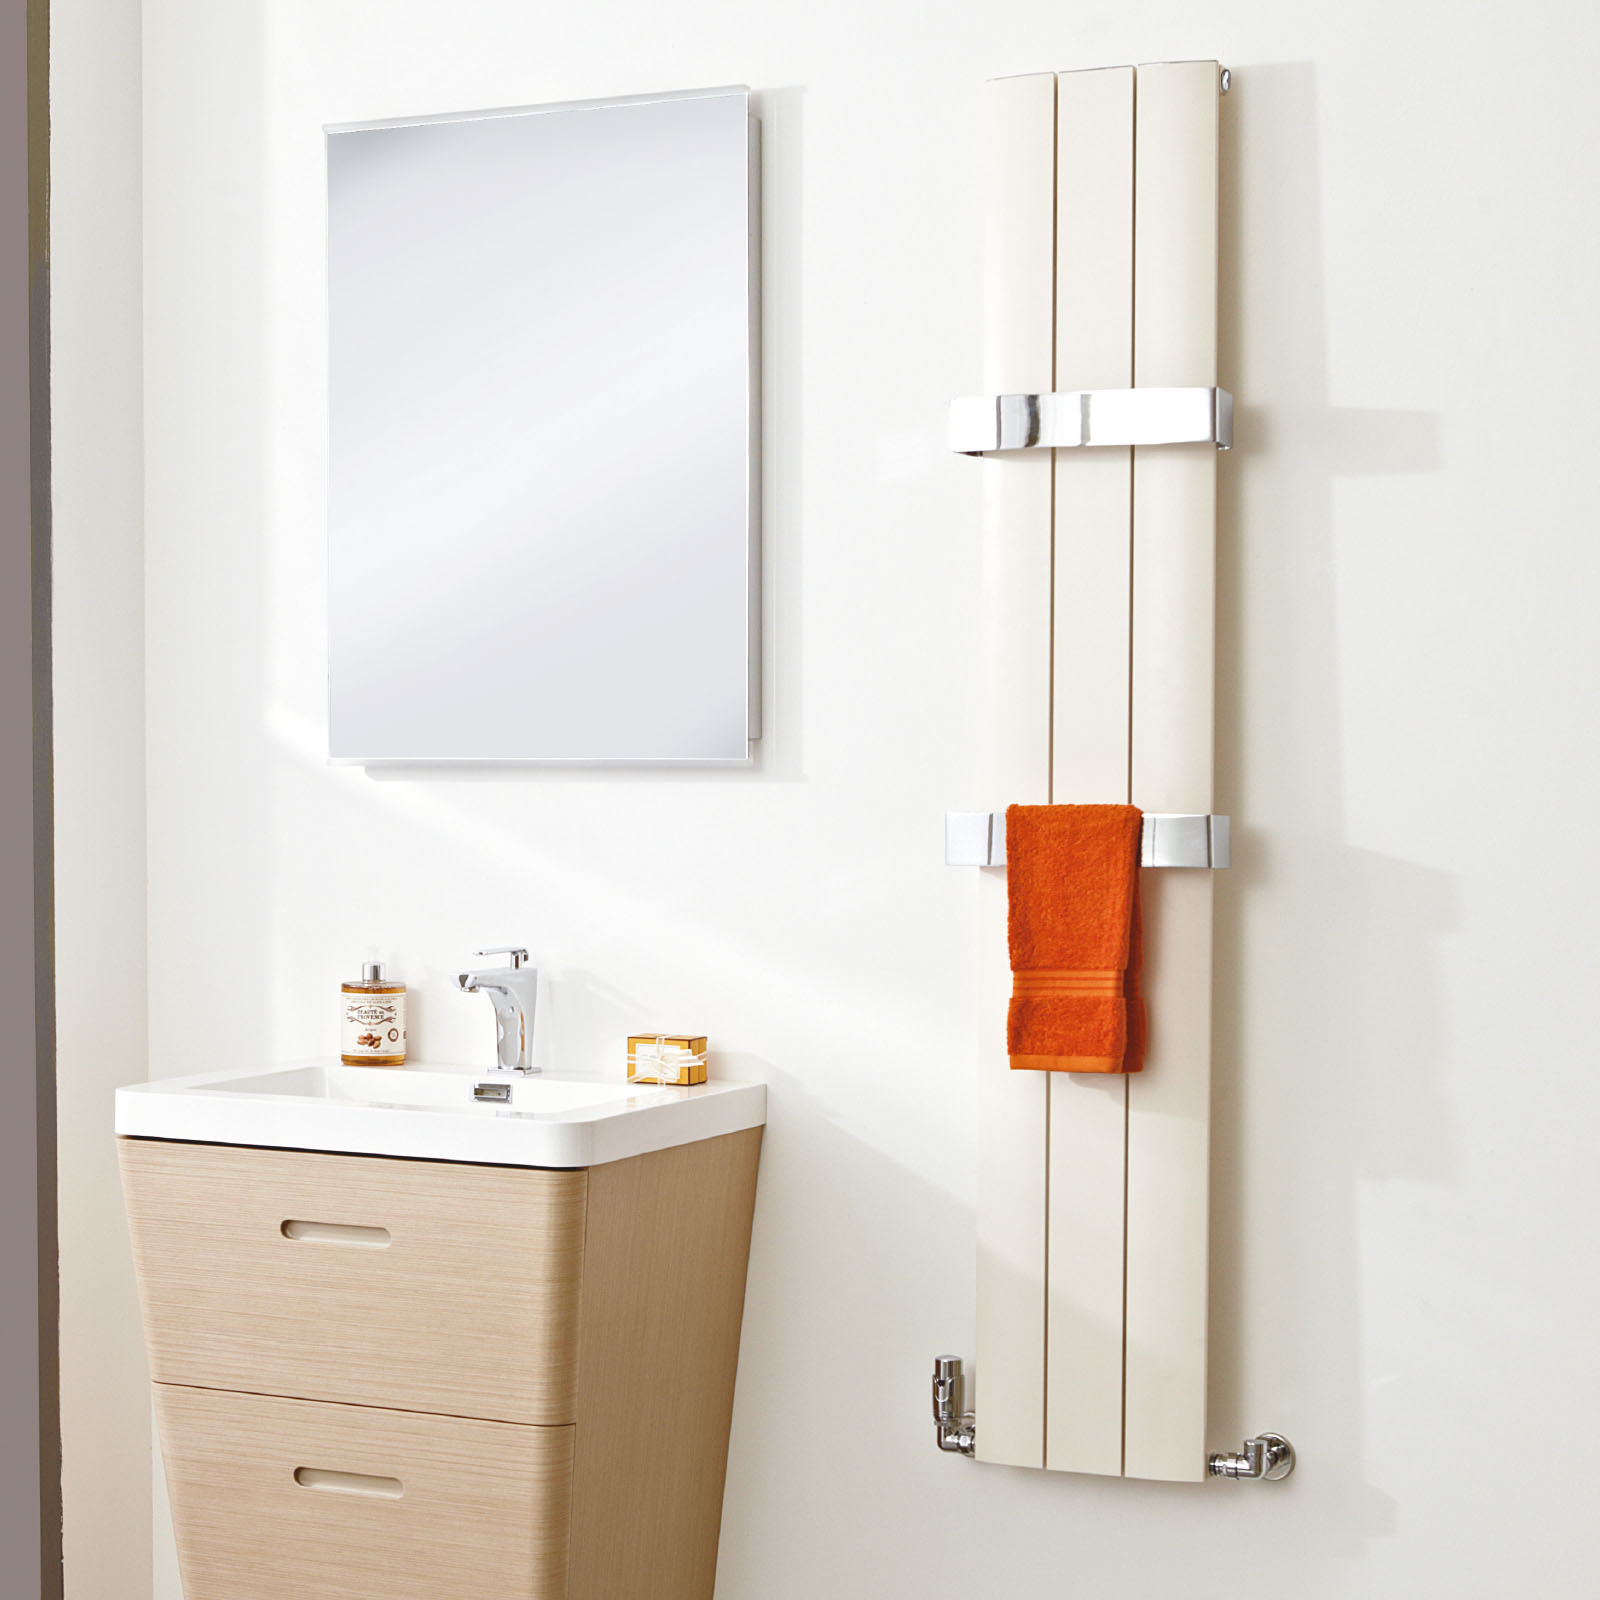 Bathrooms Radiator Image